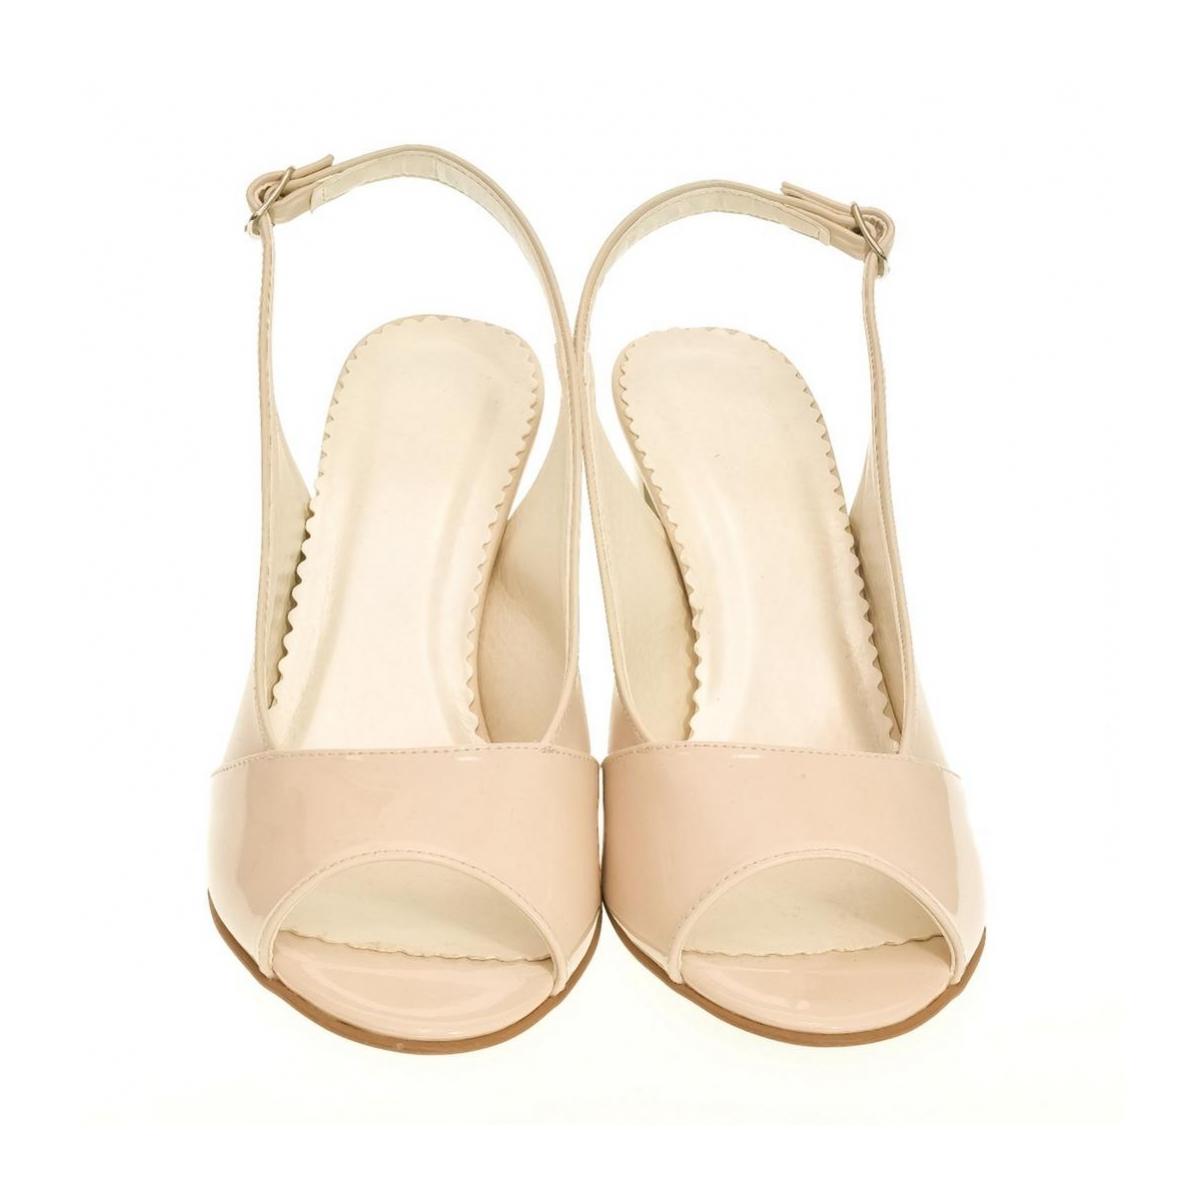 aaf8cfe574f1 Dámske bežové sandále SAINA - 2